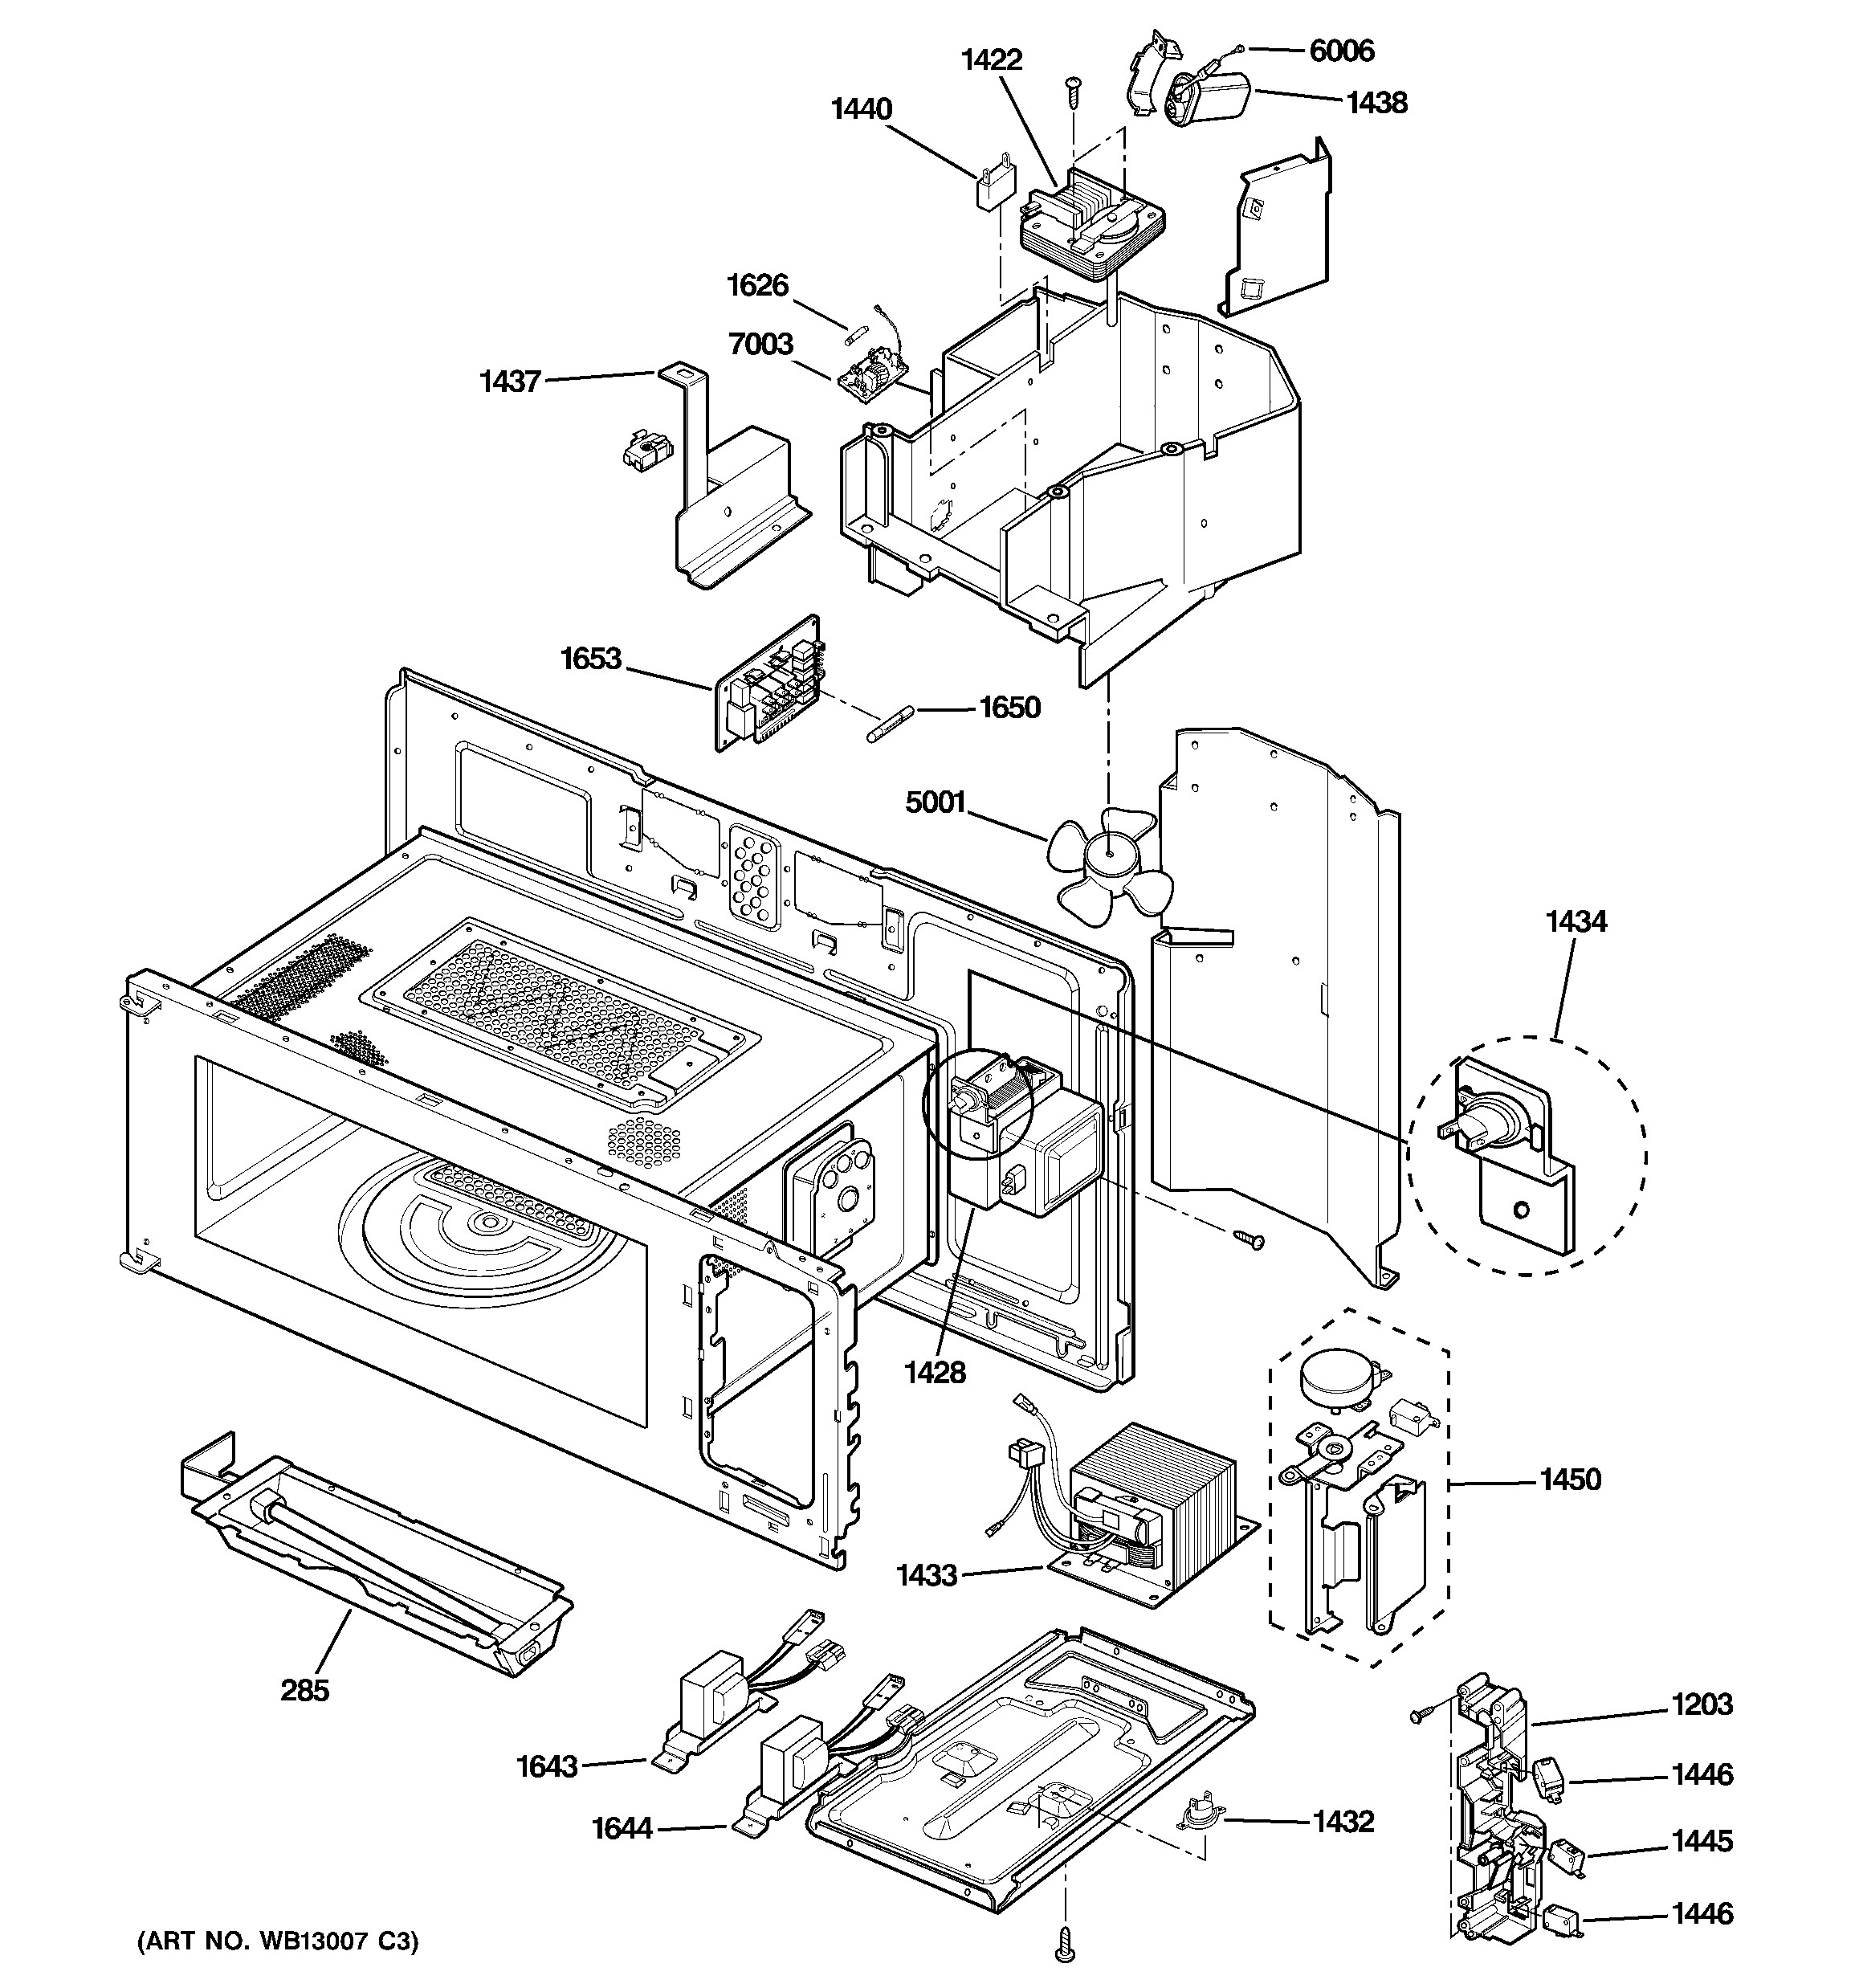 Ge Advantium 120 Parts Diagram Ge Model Sca1001kss02 Microwave Hood Bo Genuine Parts Of Ge Advantium 120 Parts Diagram